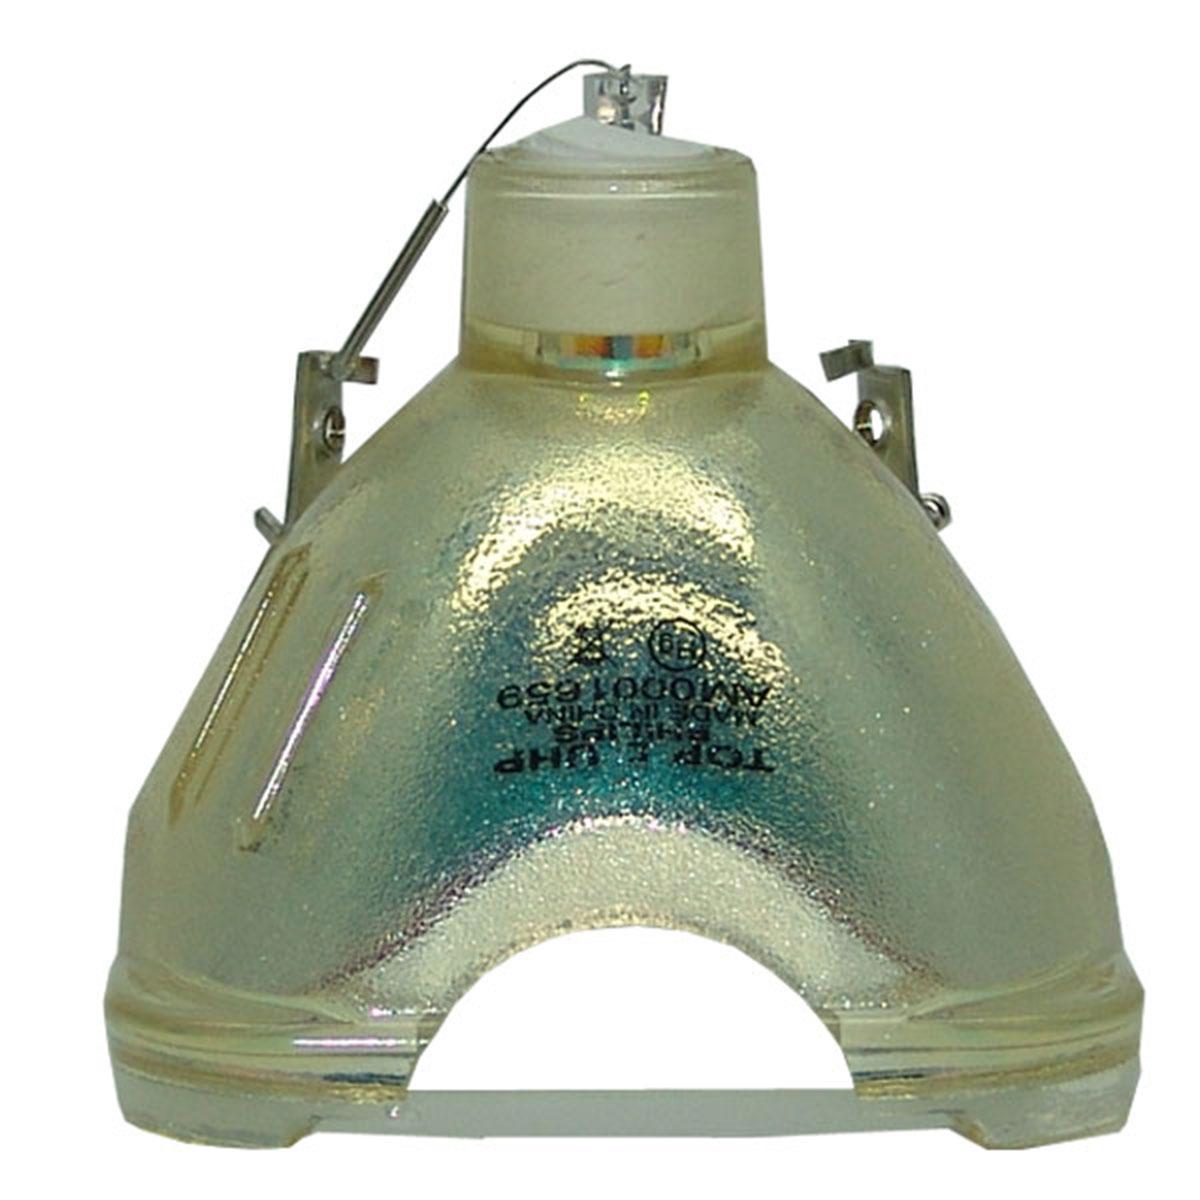 Lutema Platinum for Epson PowerLite 500 Projector Lamp (Original Philips Bulb) - image 4 of 5